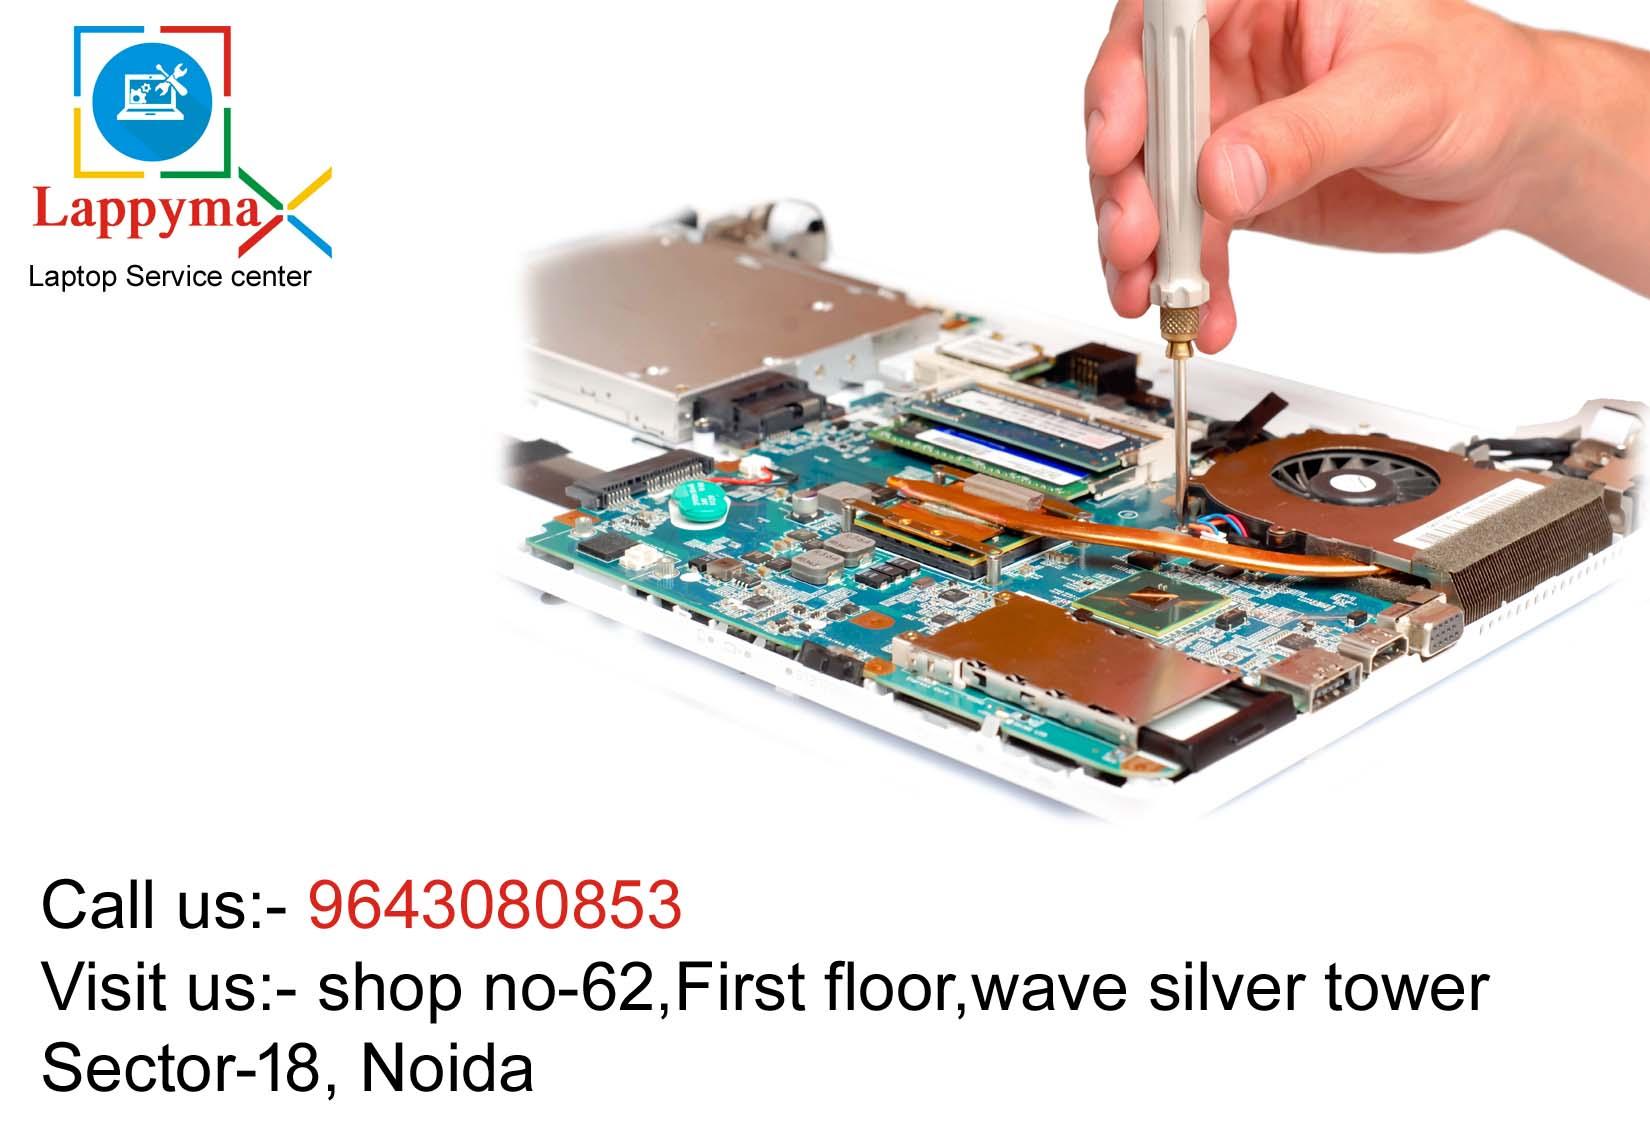 Dell Service center in Noida sector 18